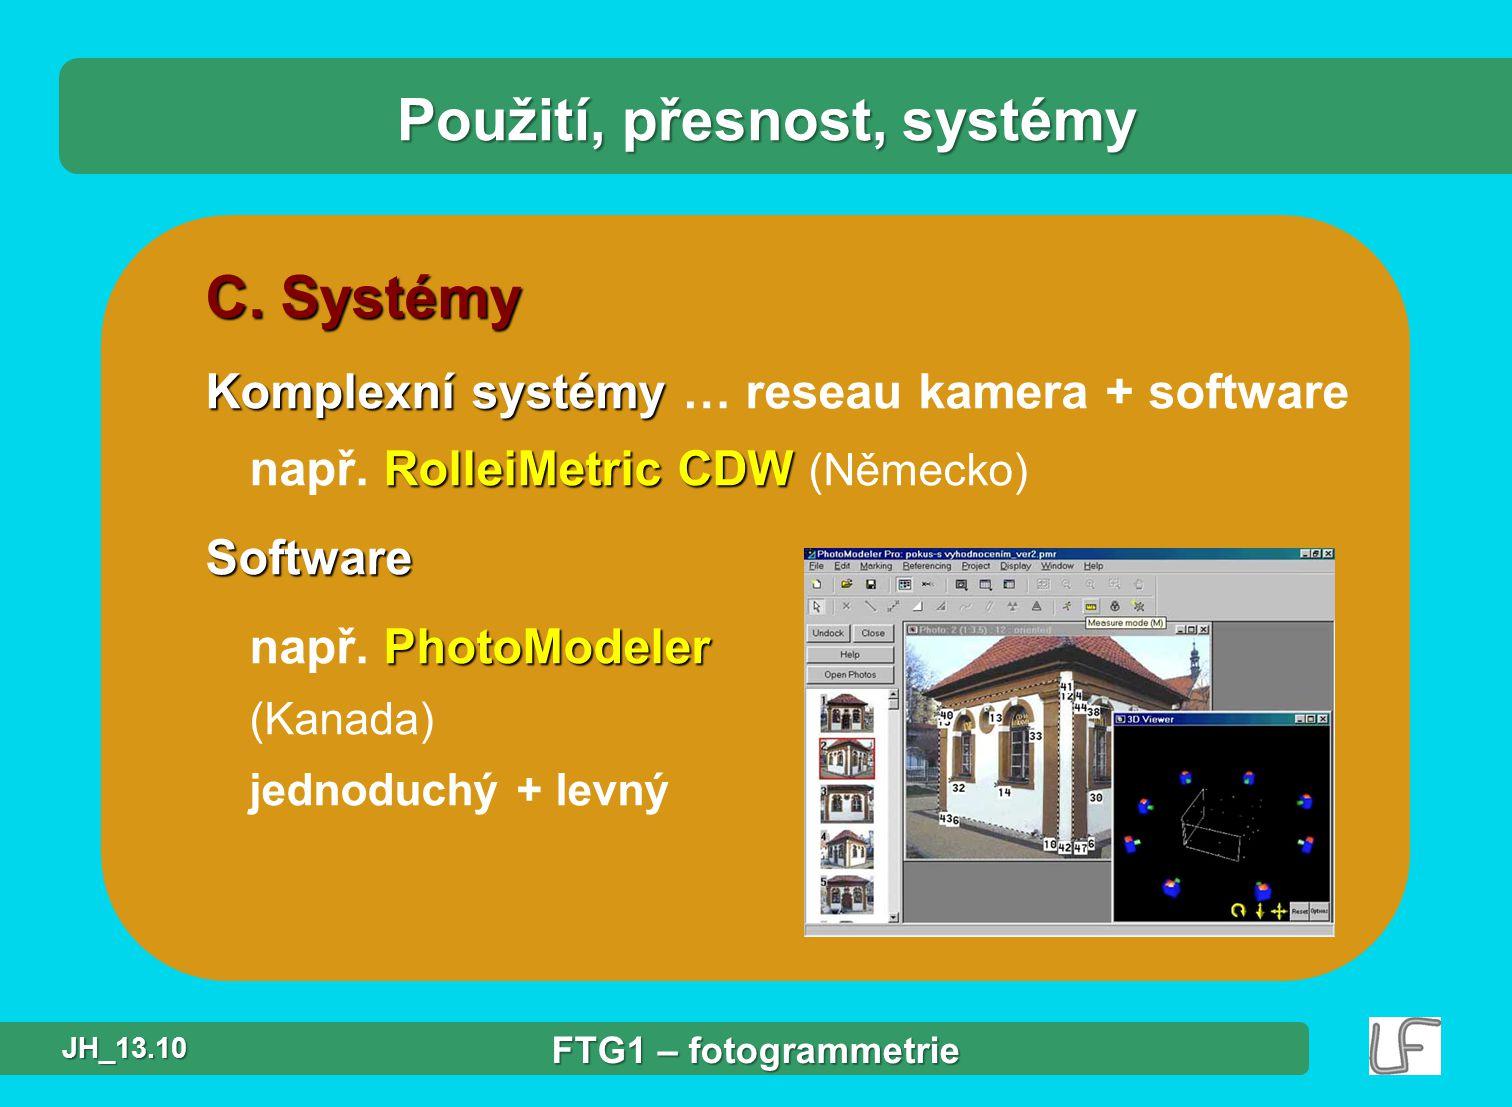 C. Systémy Komplexní systémy Komplexní systémy … reseau kamera + software RolleiMetric CDW např. RolleiMetric CDW (Německo)Software PhotoModeler např.